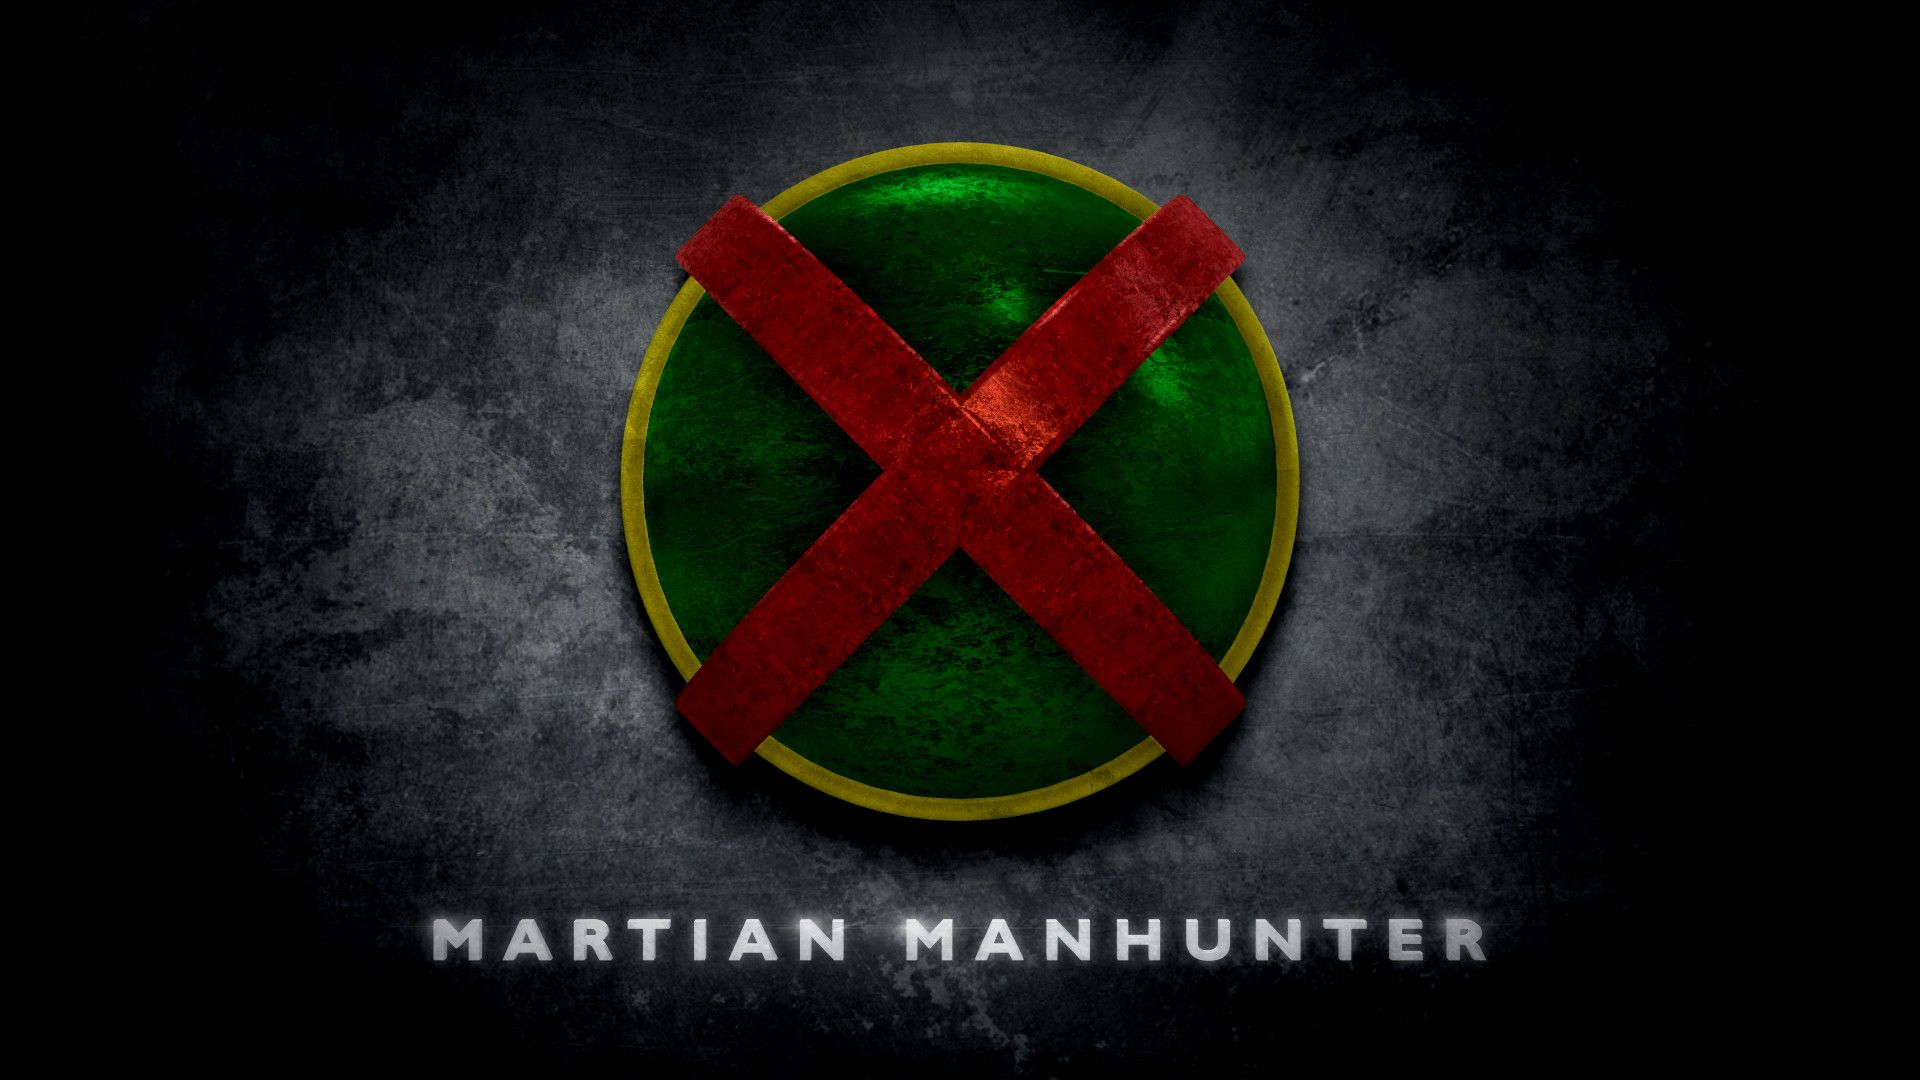 martian manhunter logo dc comics pinterest